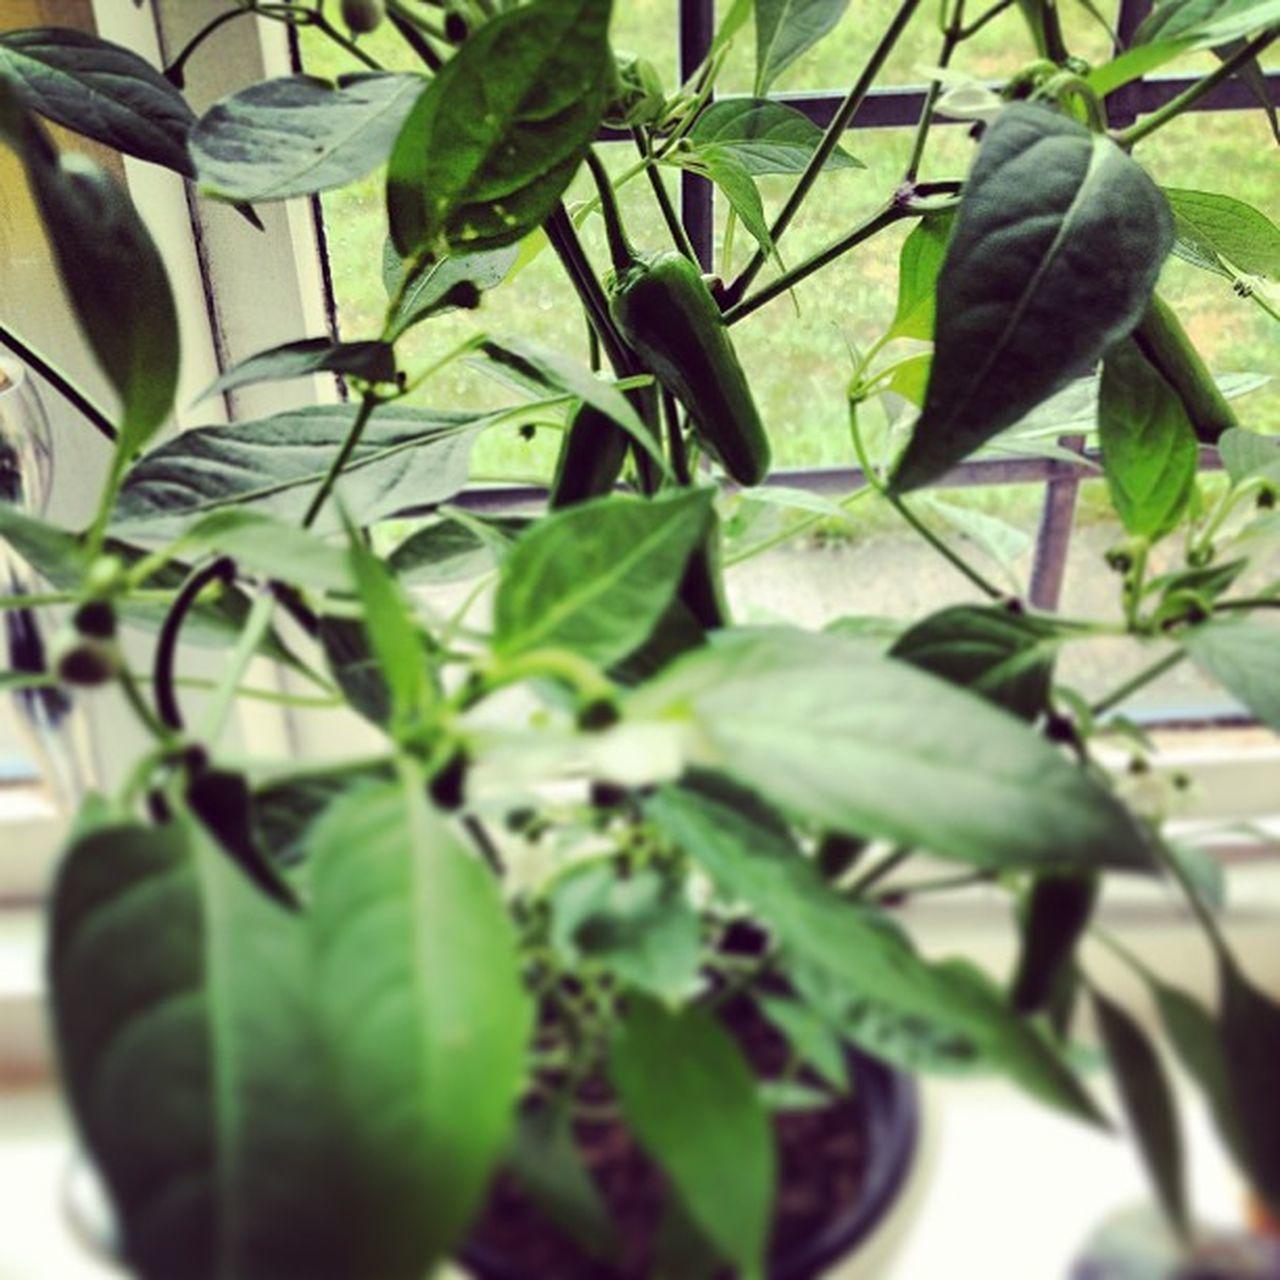 Chillipepper Chilli Plants Green Leaves Green In Bloom